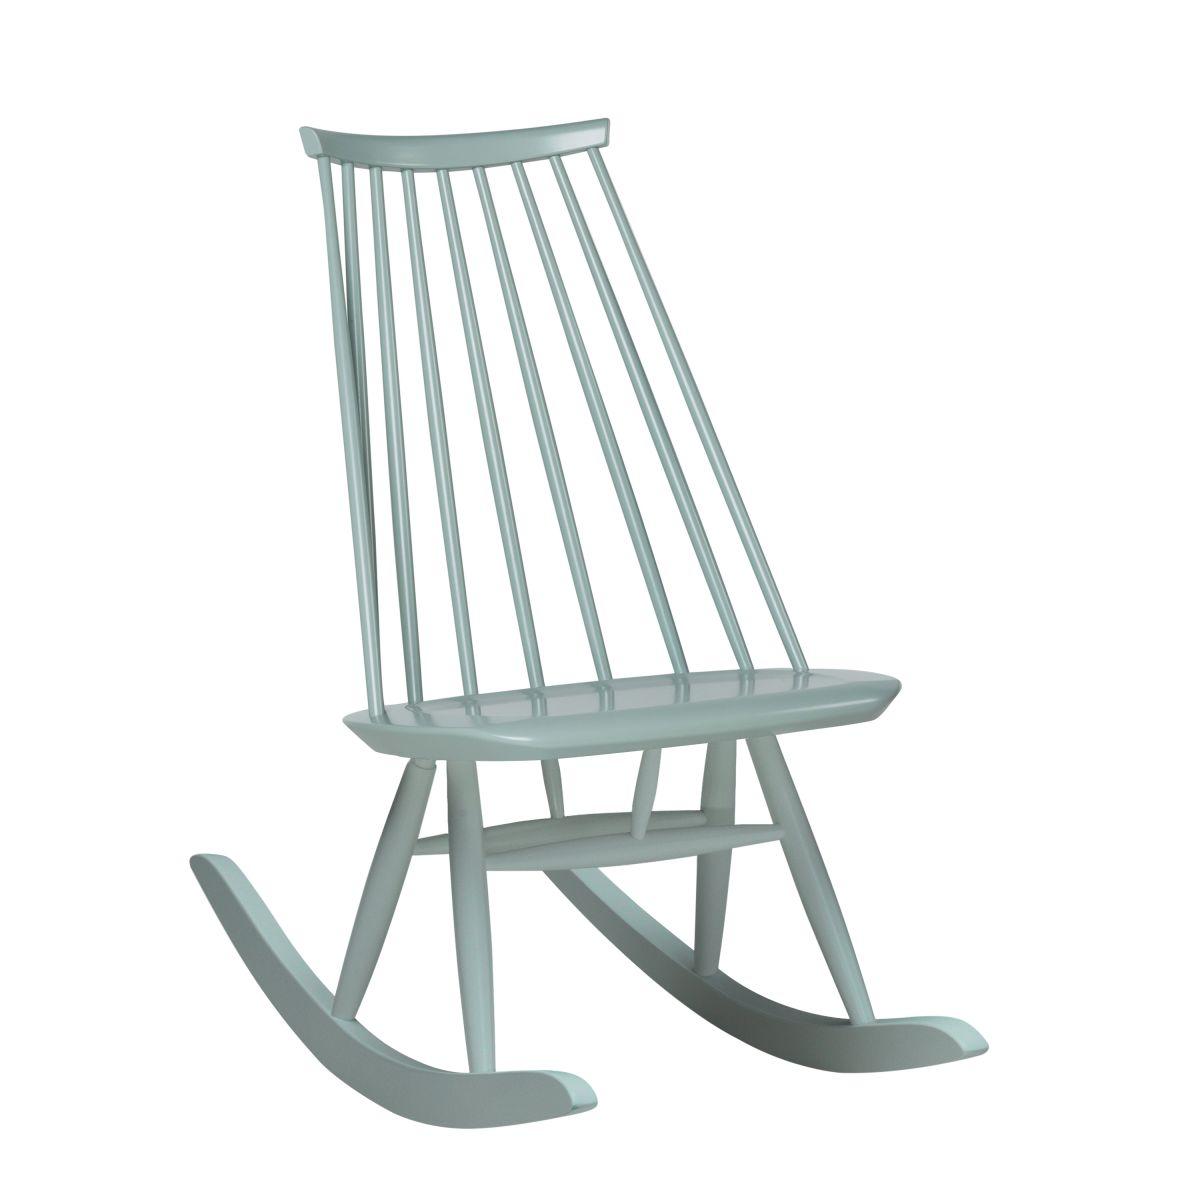 Mademoiselle Rocking Chair Sage Green 2494524